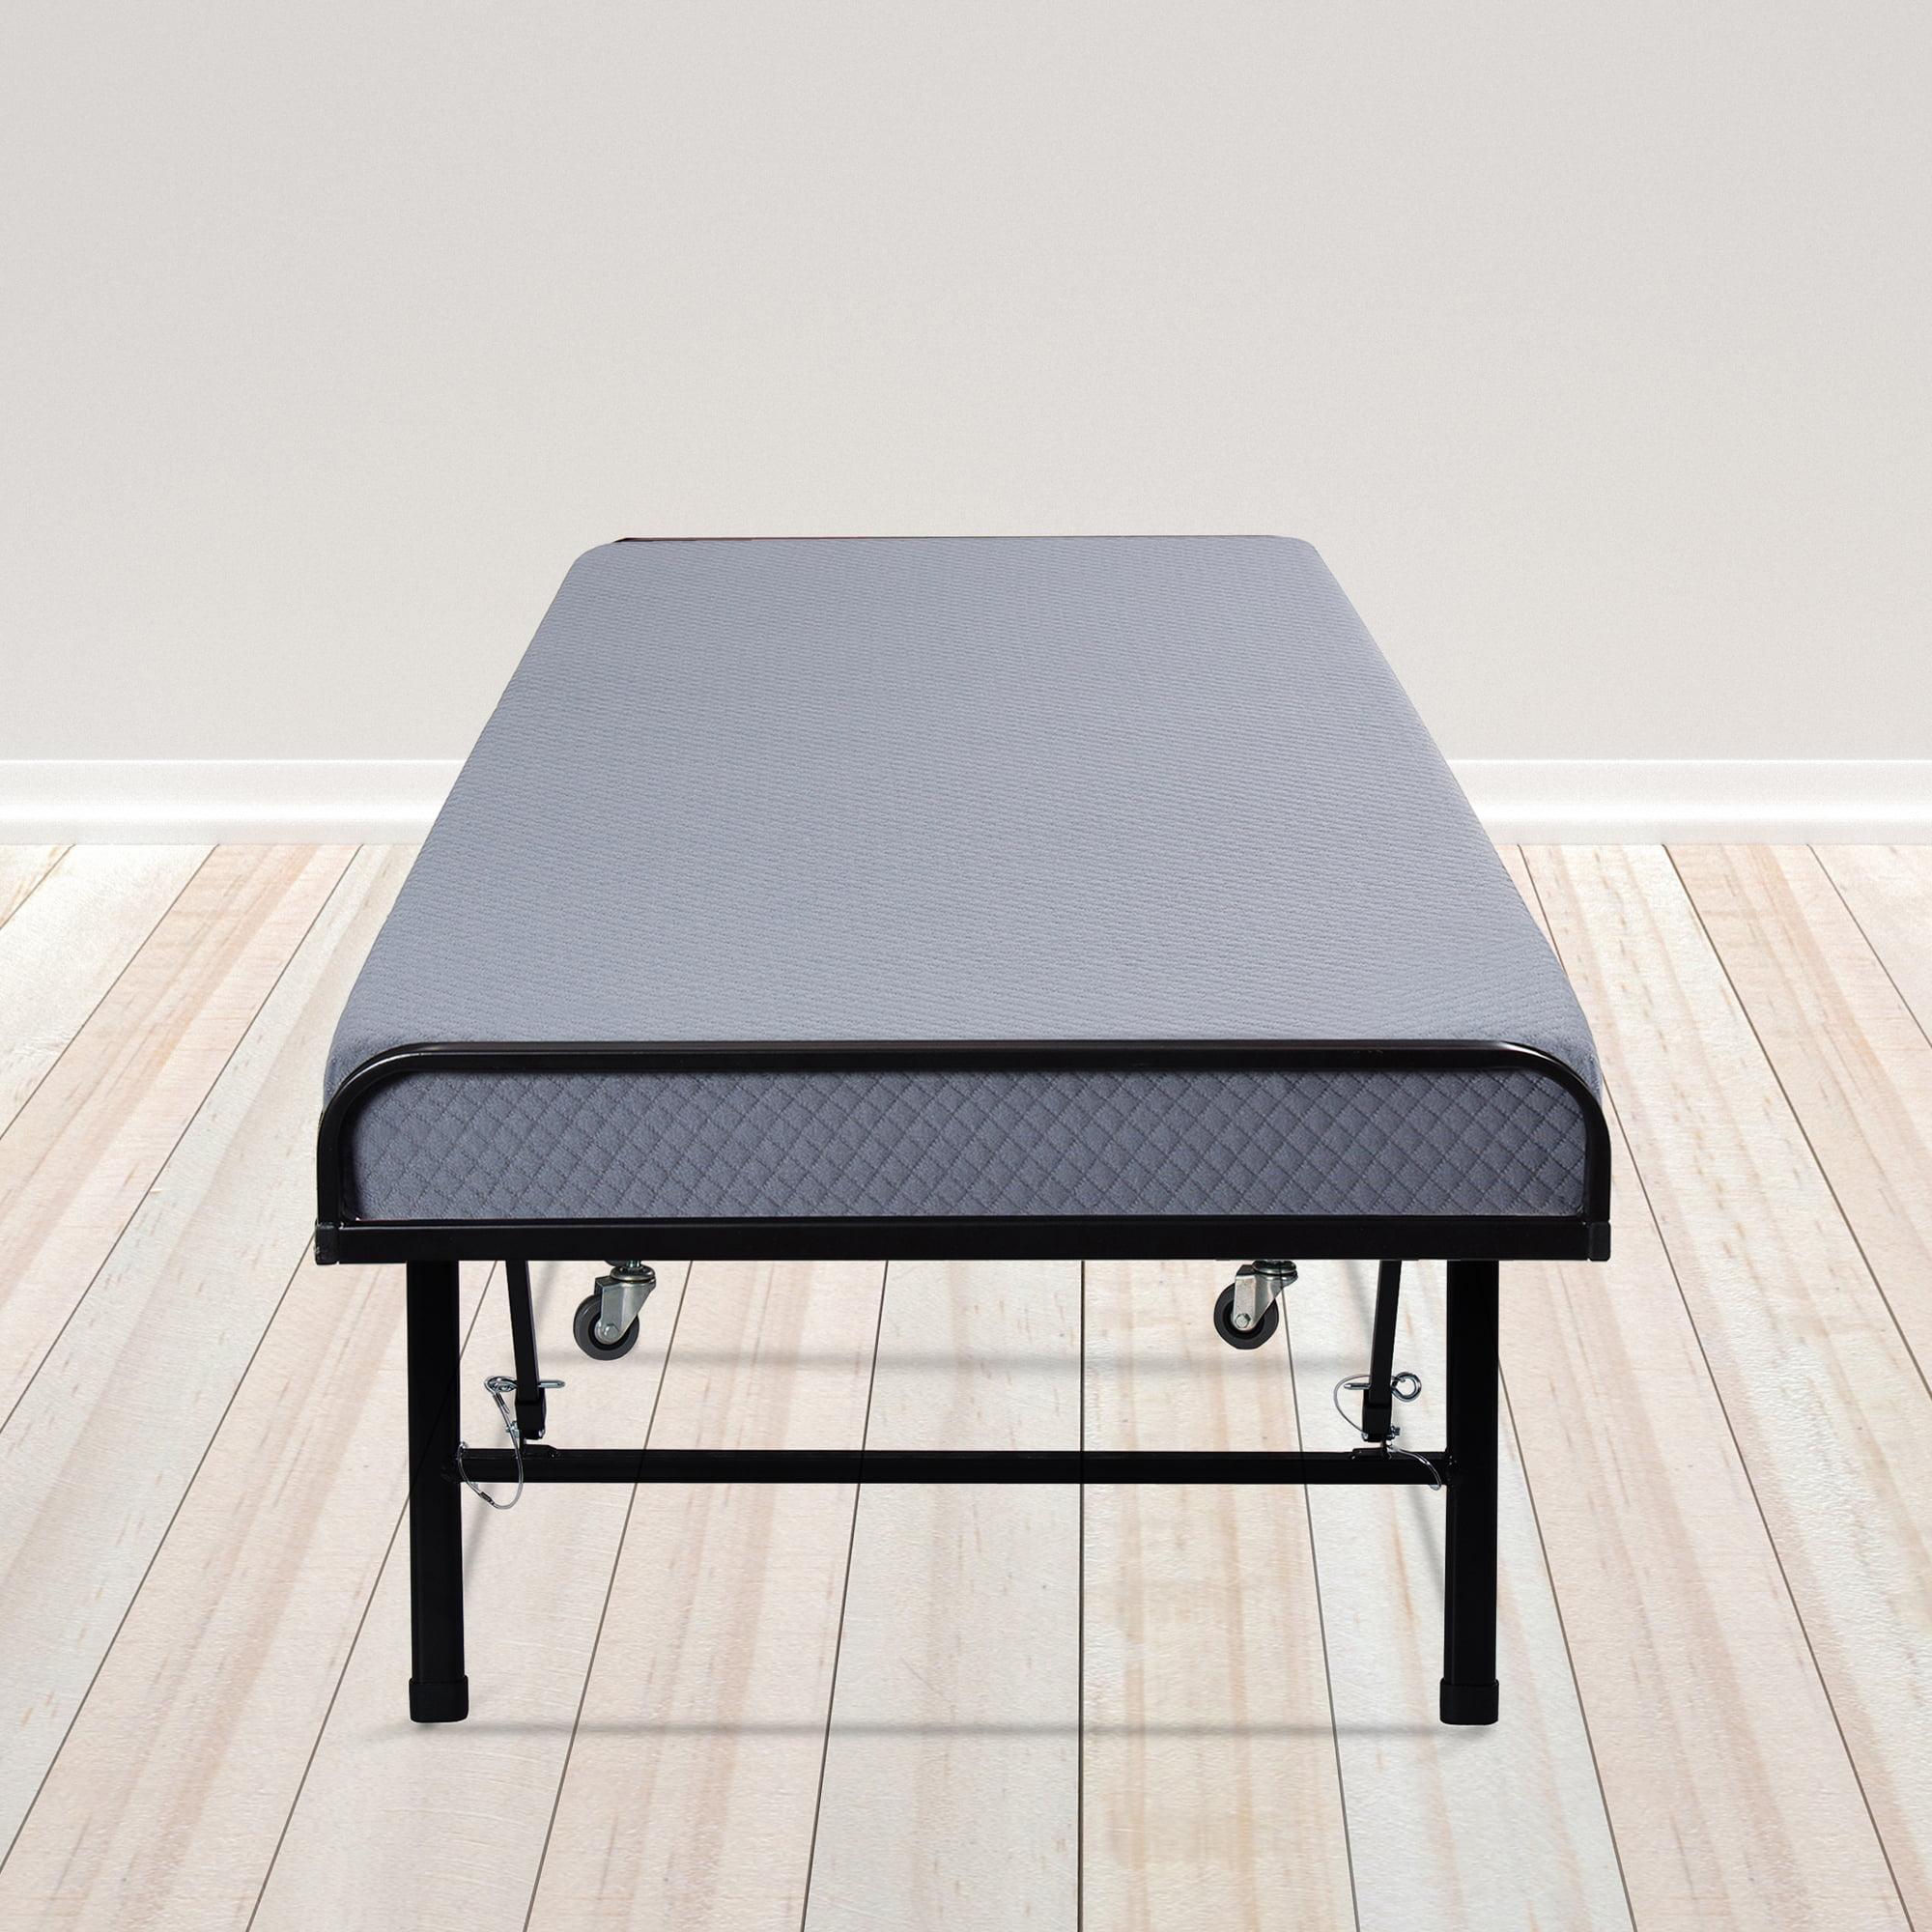 GranRest Innovative Portable Metal Folding Guest Bed with Gel Memory Foam Mattress